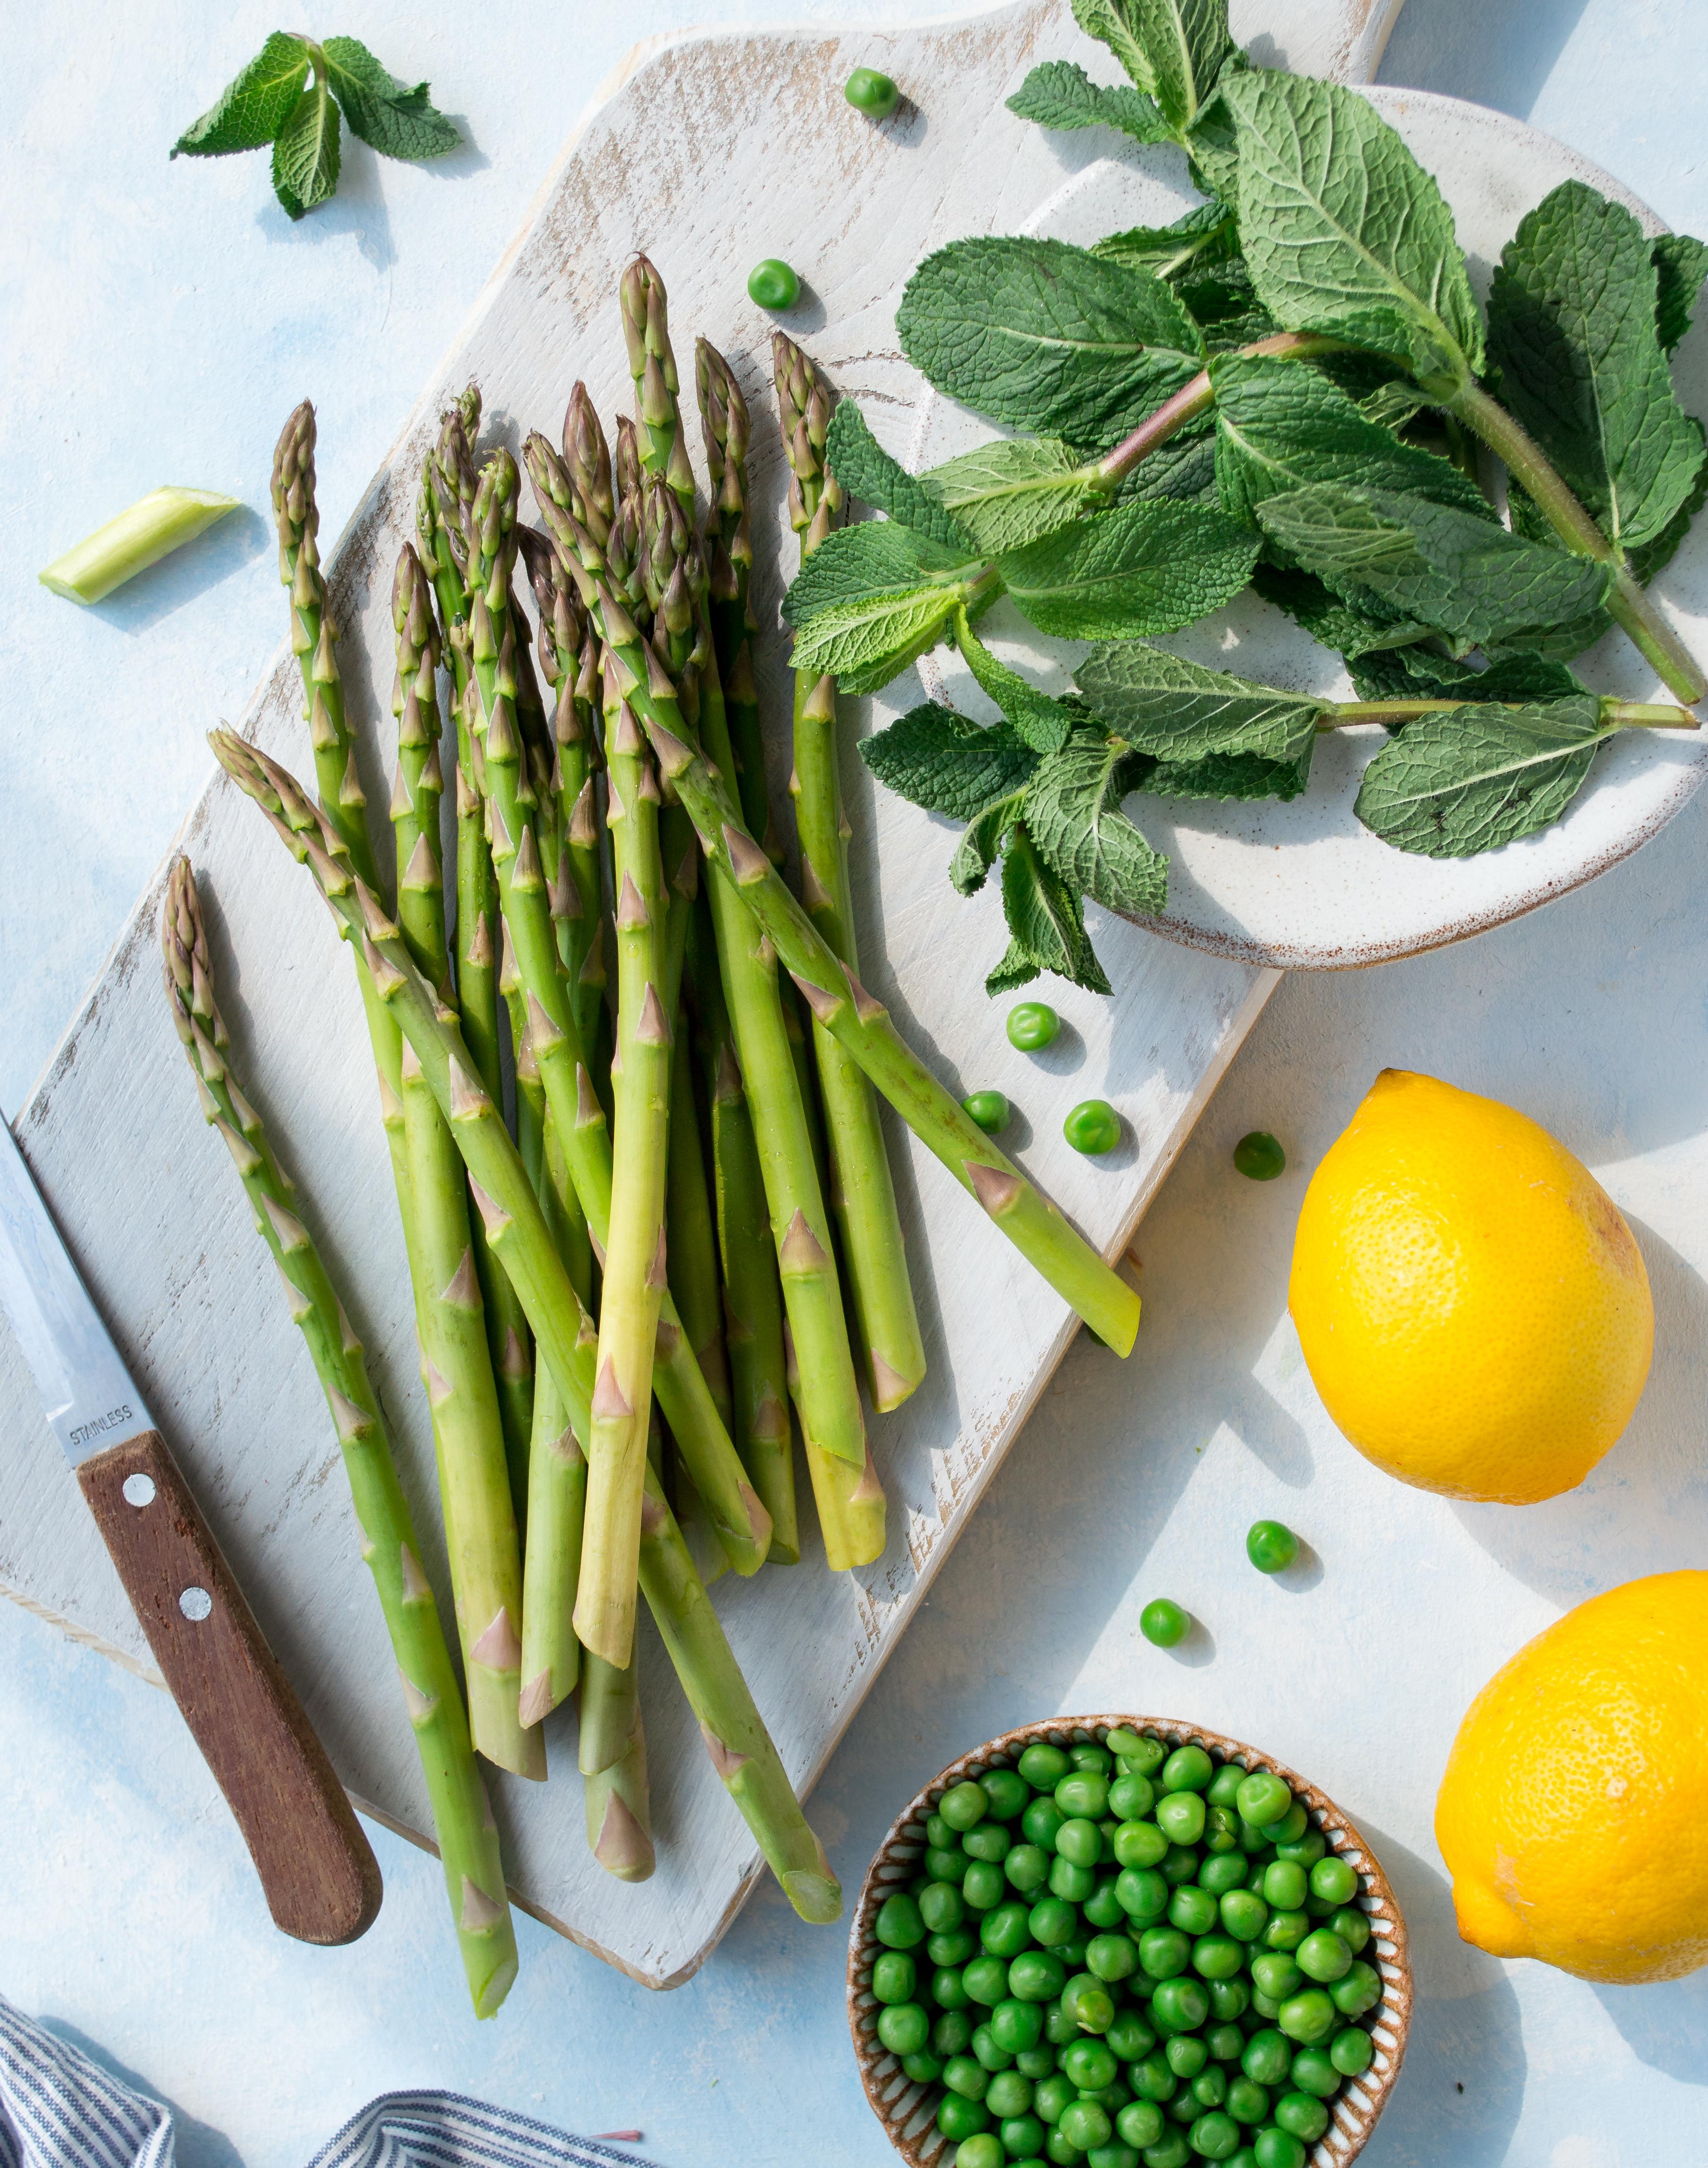 Overhead shot of asparagus, mint, peas, lemons